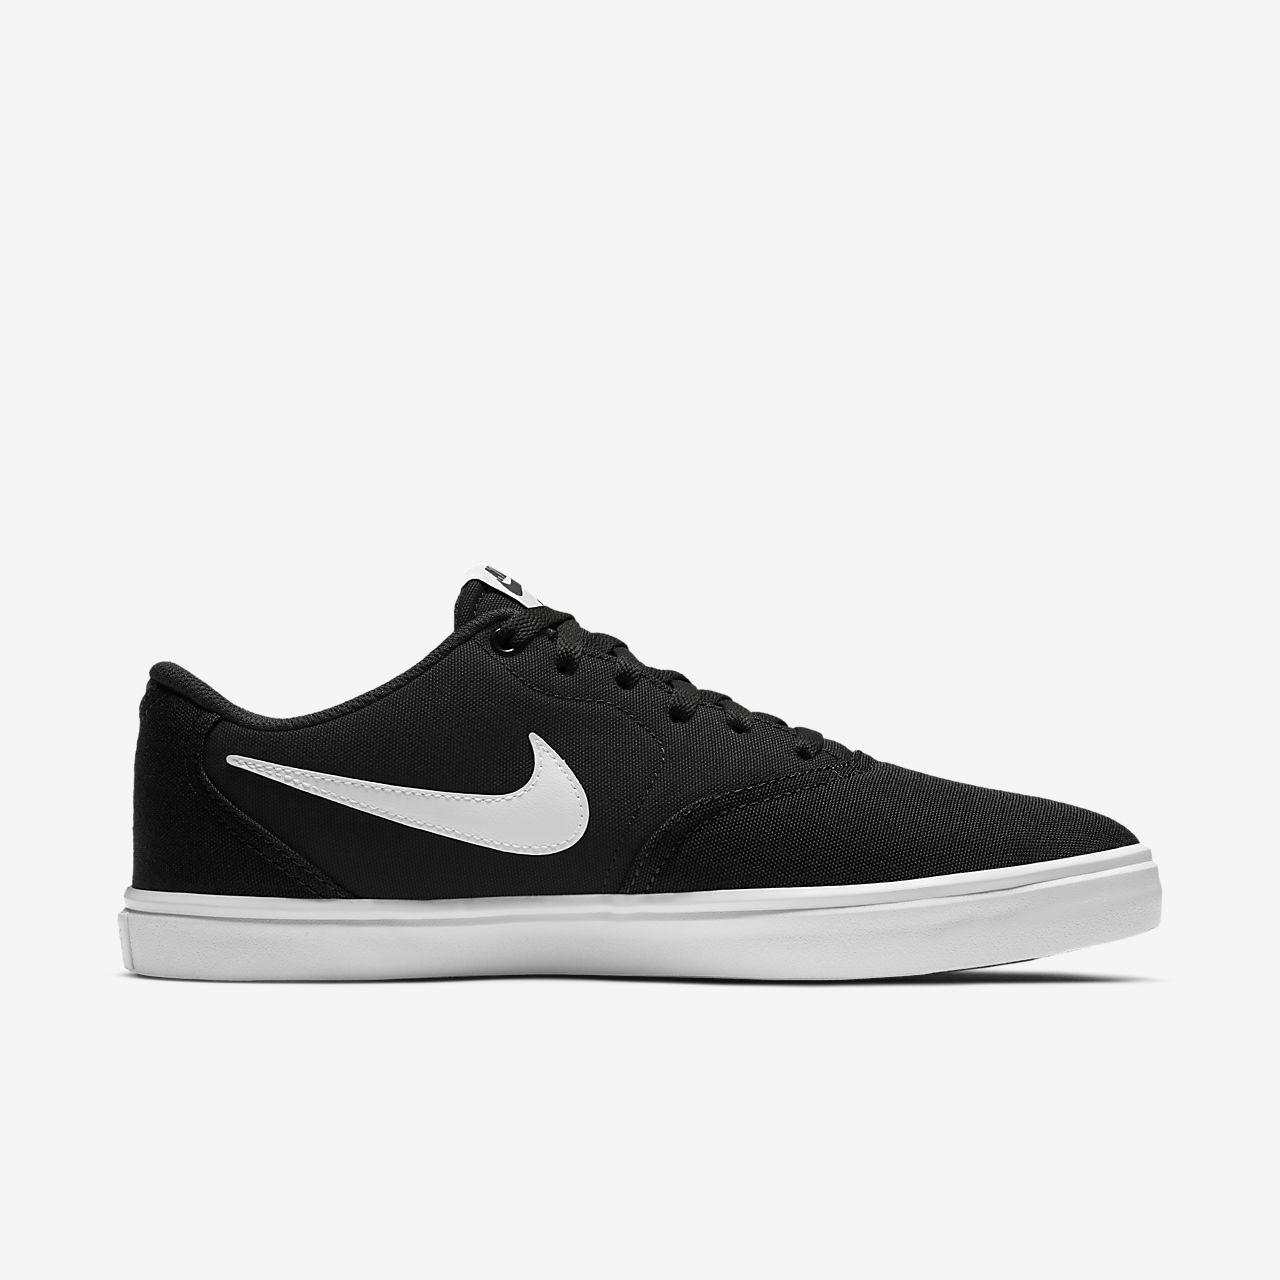 Nike Sb Check Solarsoft Canvas Men S Skateboarding Shoe